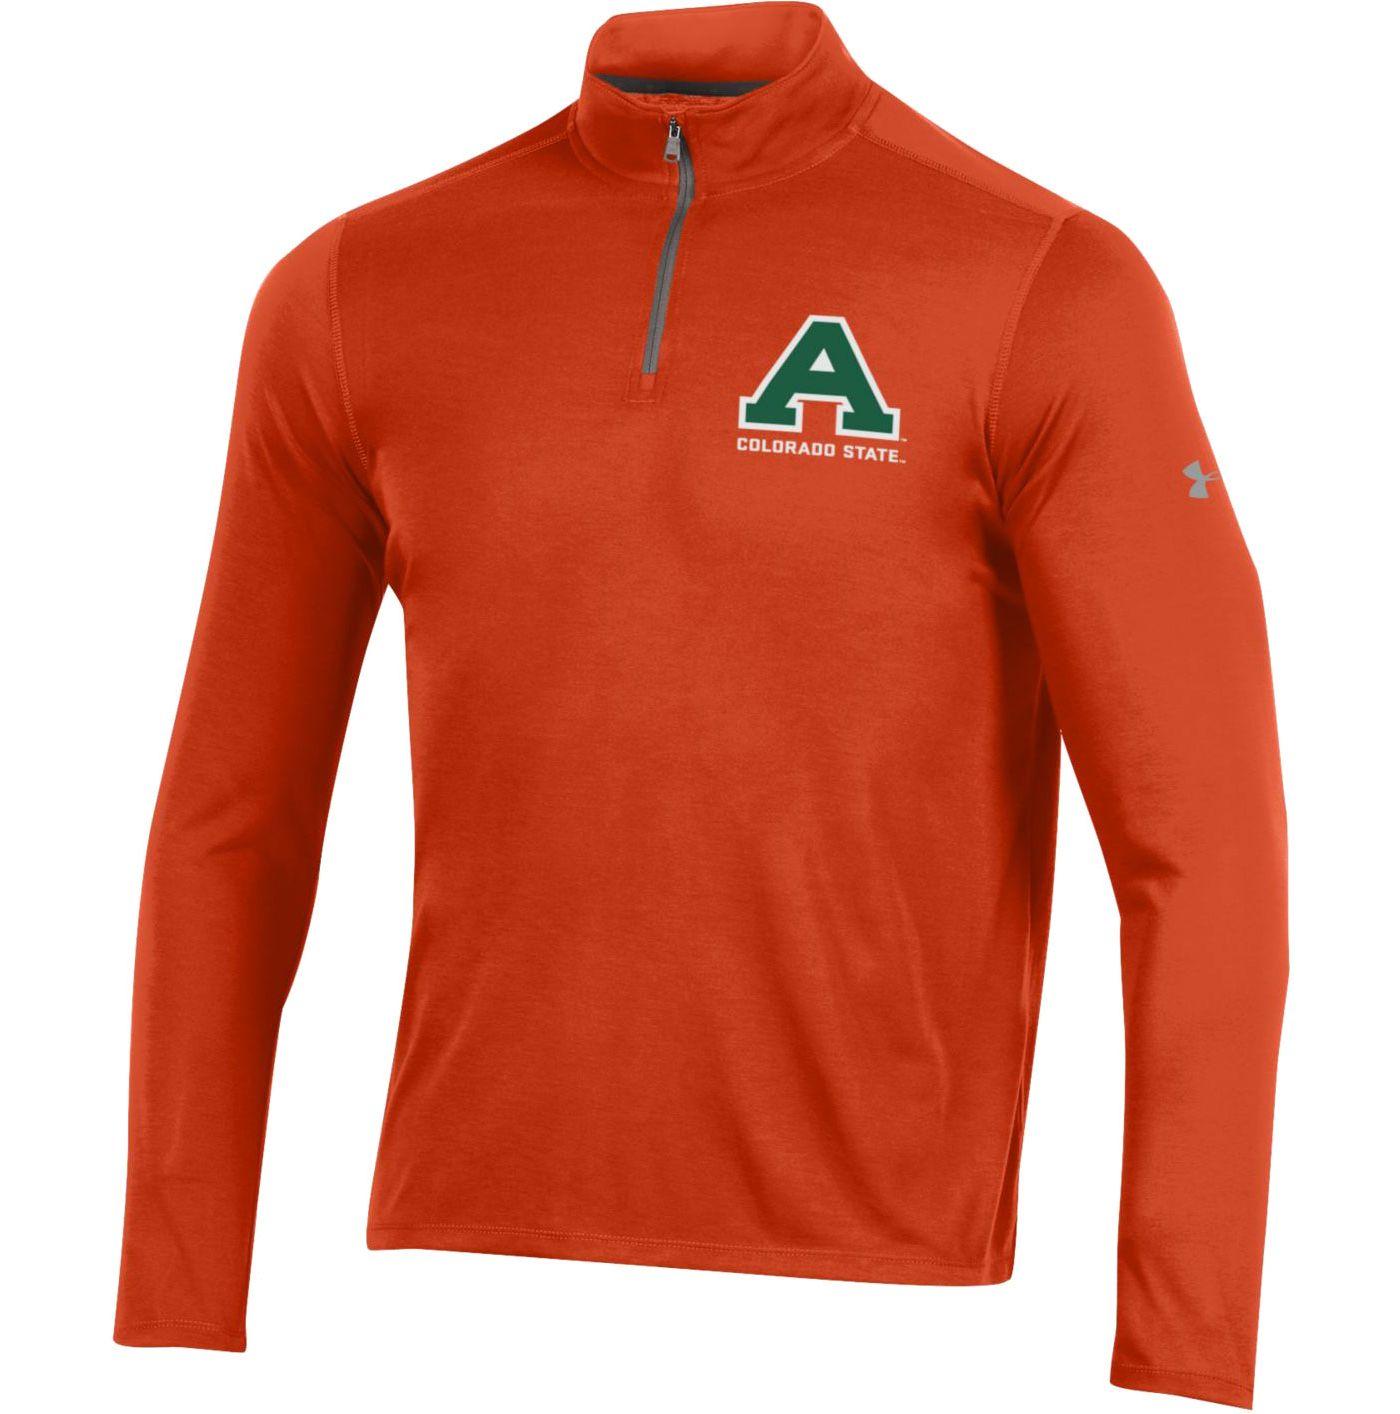 Under Armour Men's Colorado State Rams Orange Threadborne Quarter-Zip Performance Fleece